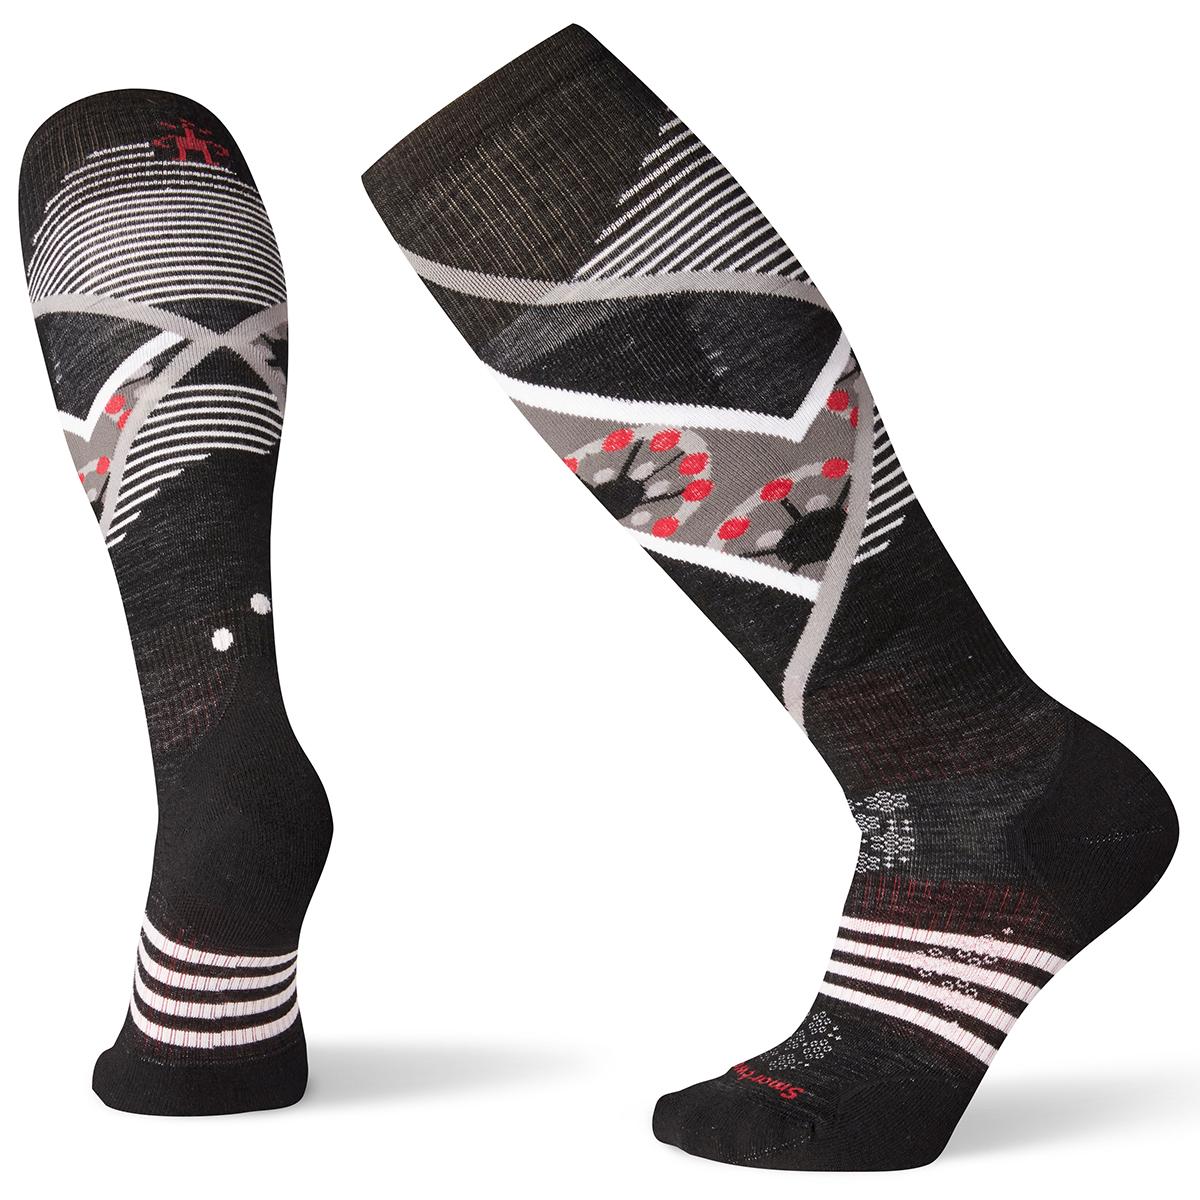 Smartwool Women's Phd Ski Light Elite Pattern Socks - Black, L